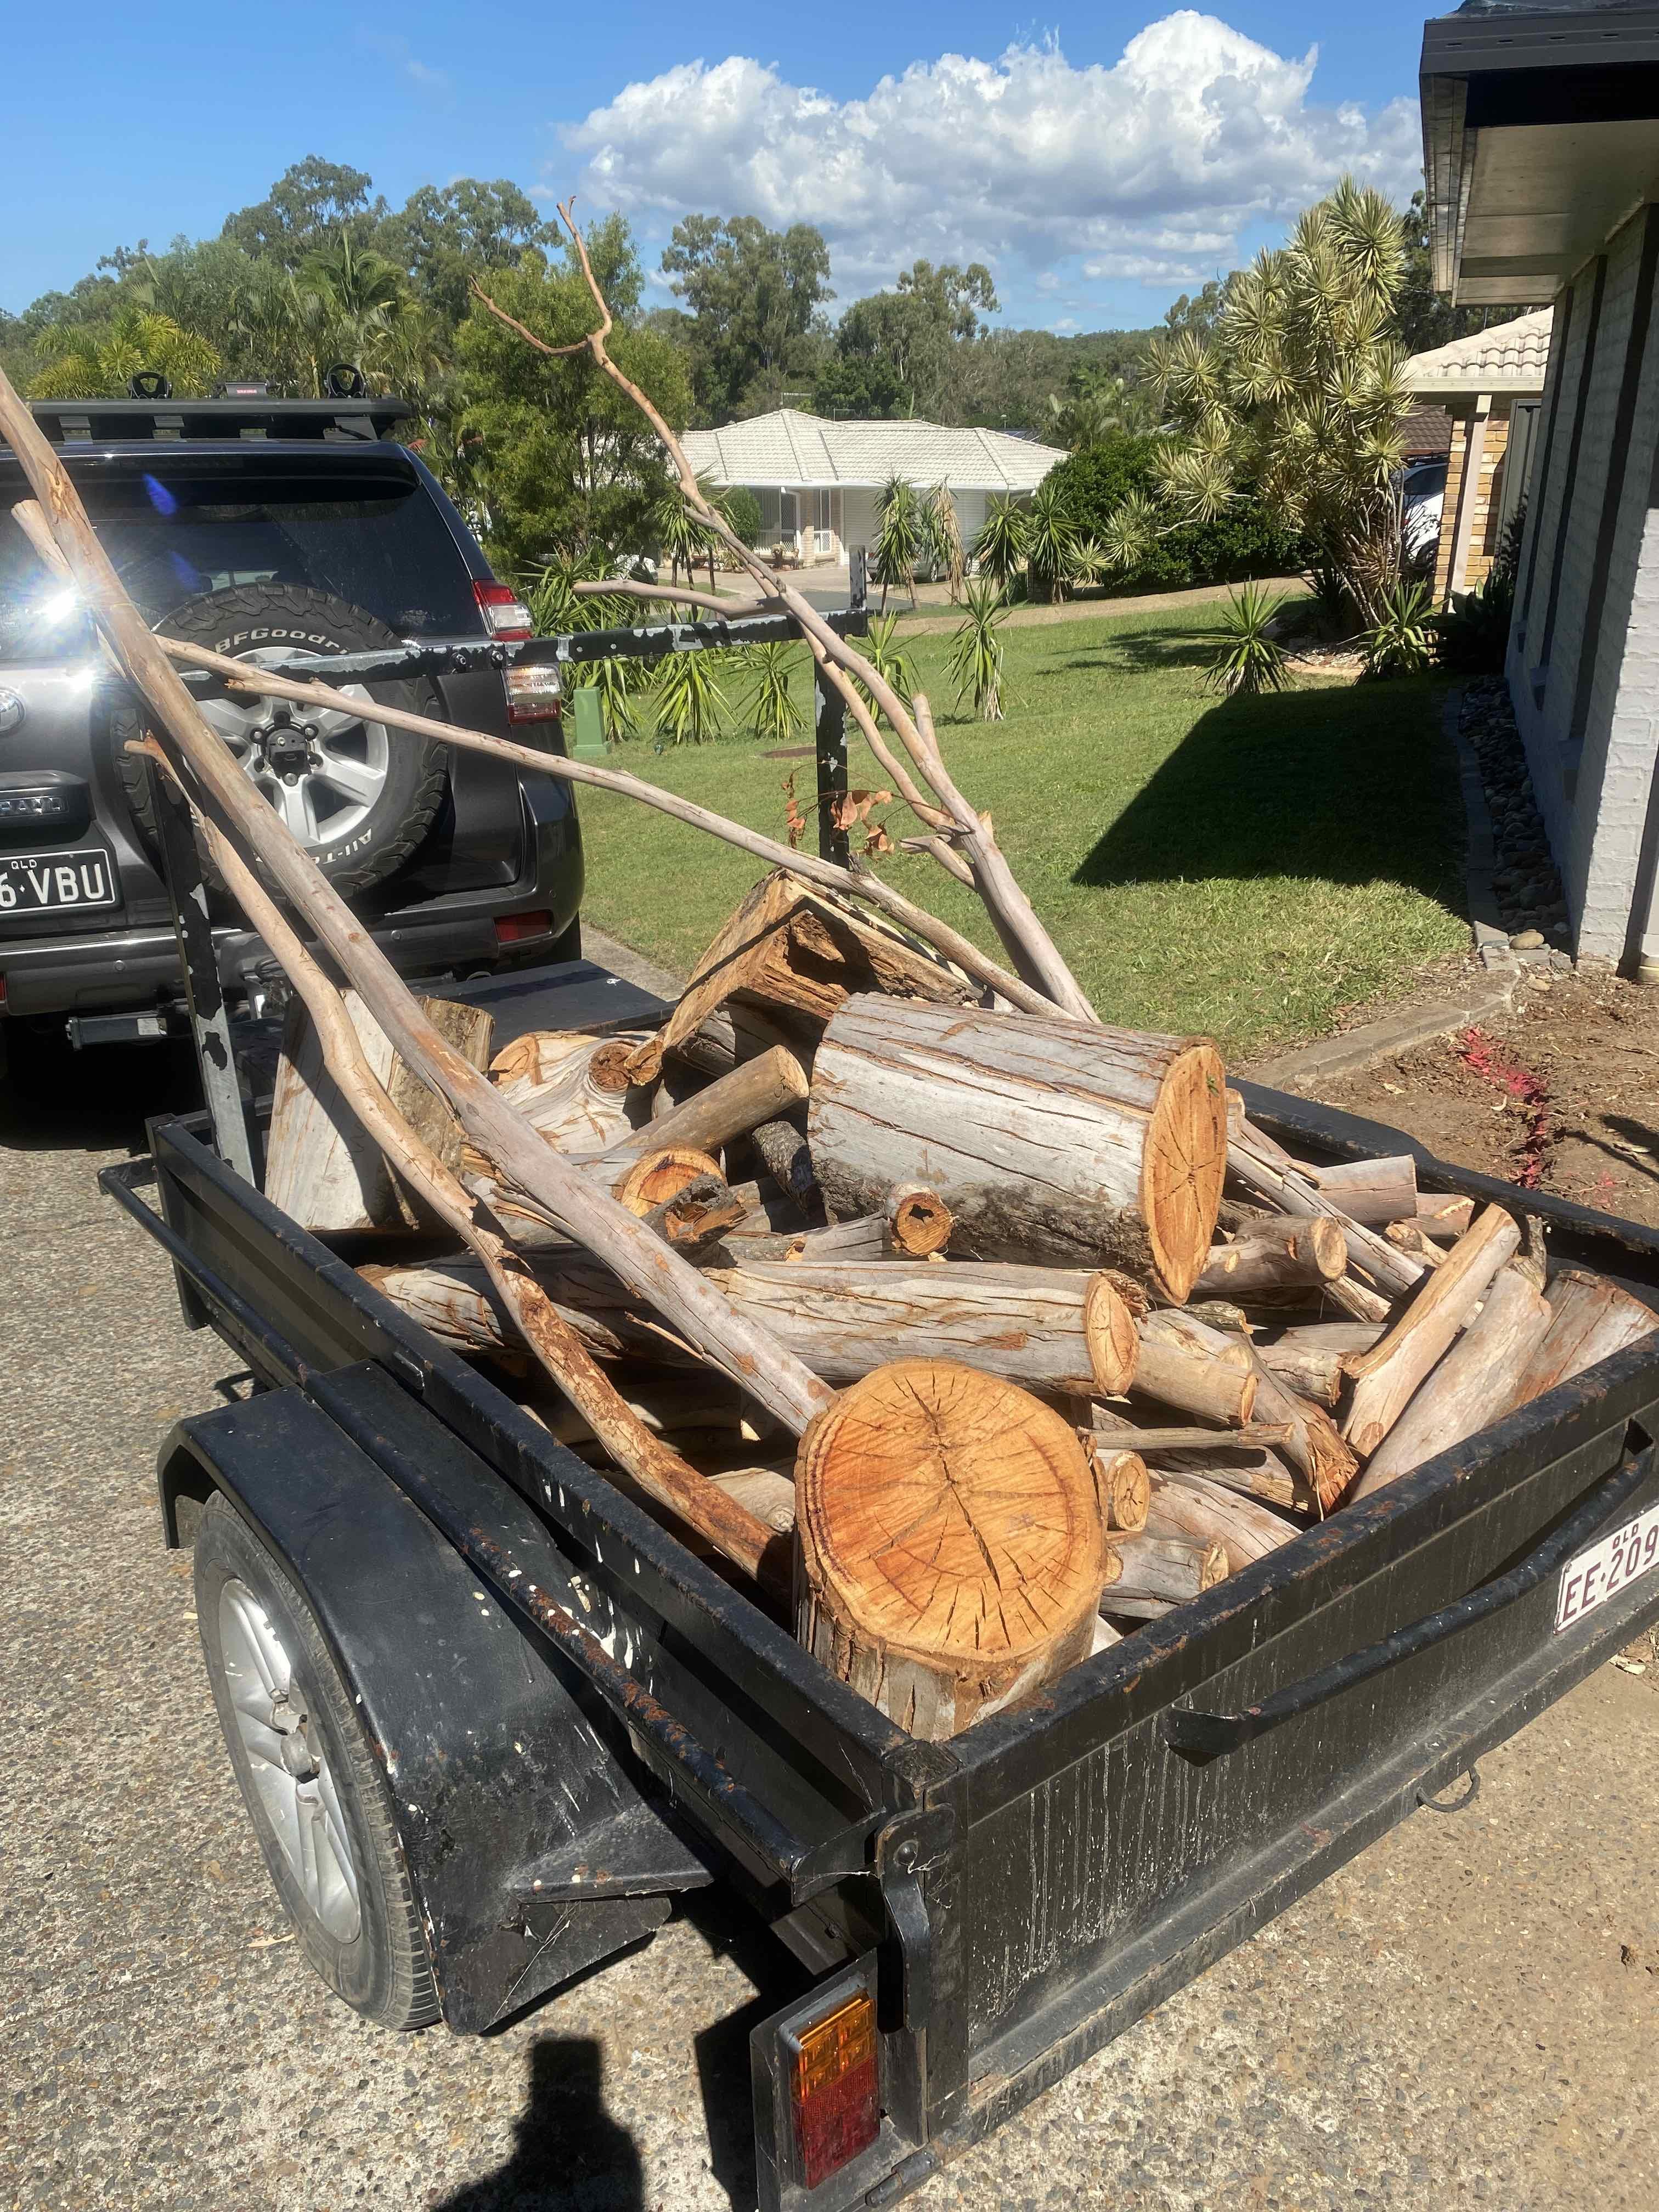 Covid_firewood.jpg